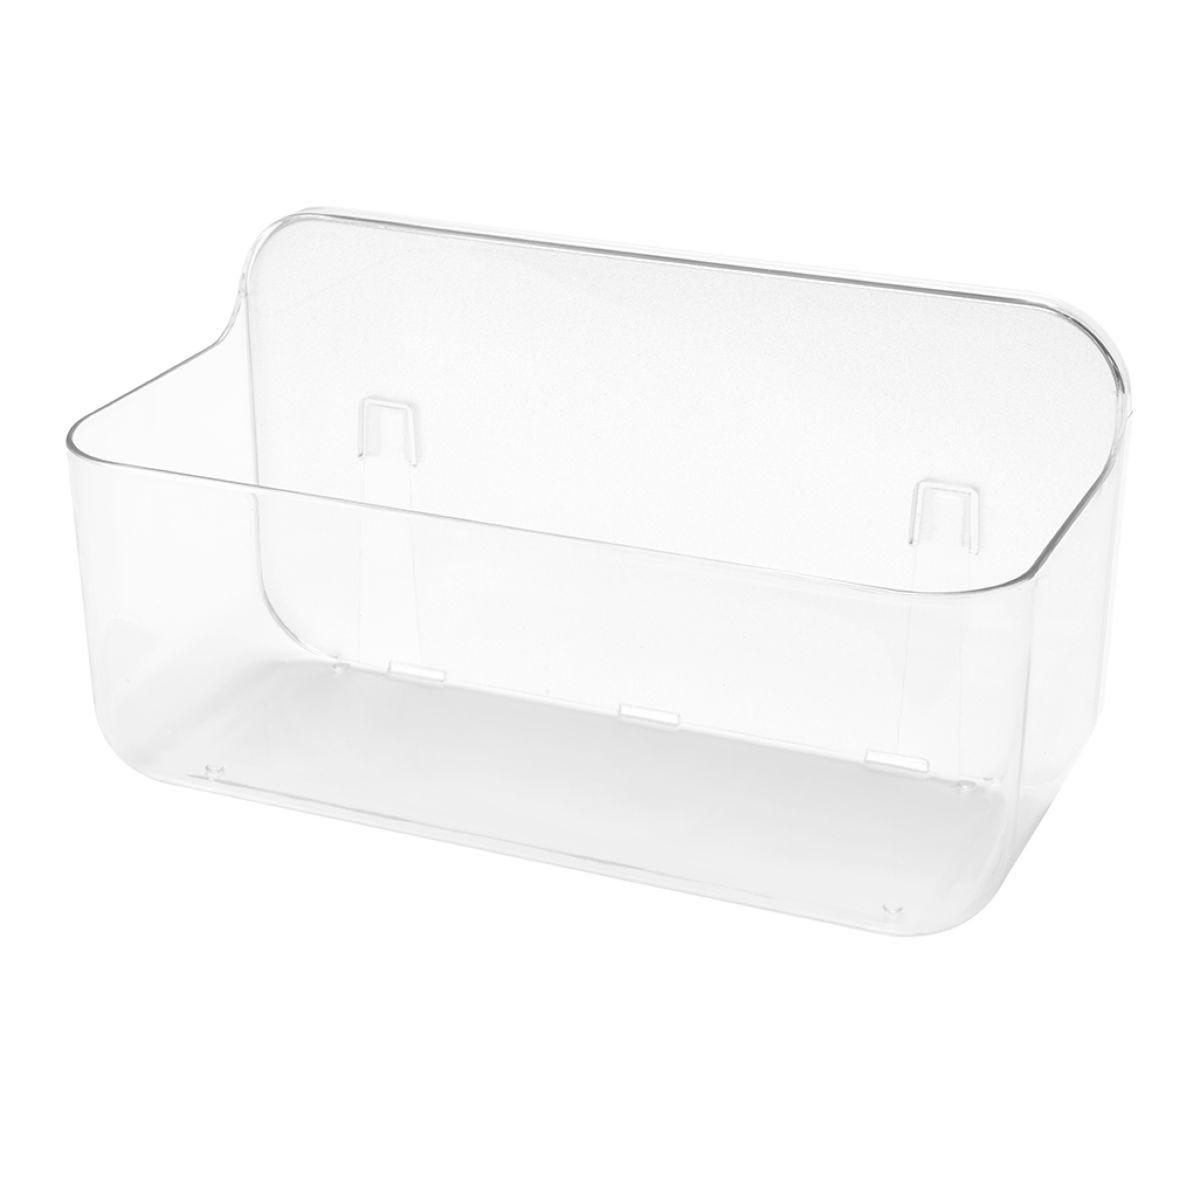 Addis Invisifix Large Bathroom Caddy - Clear